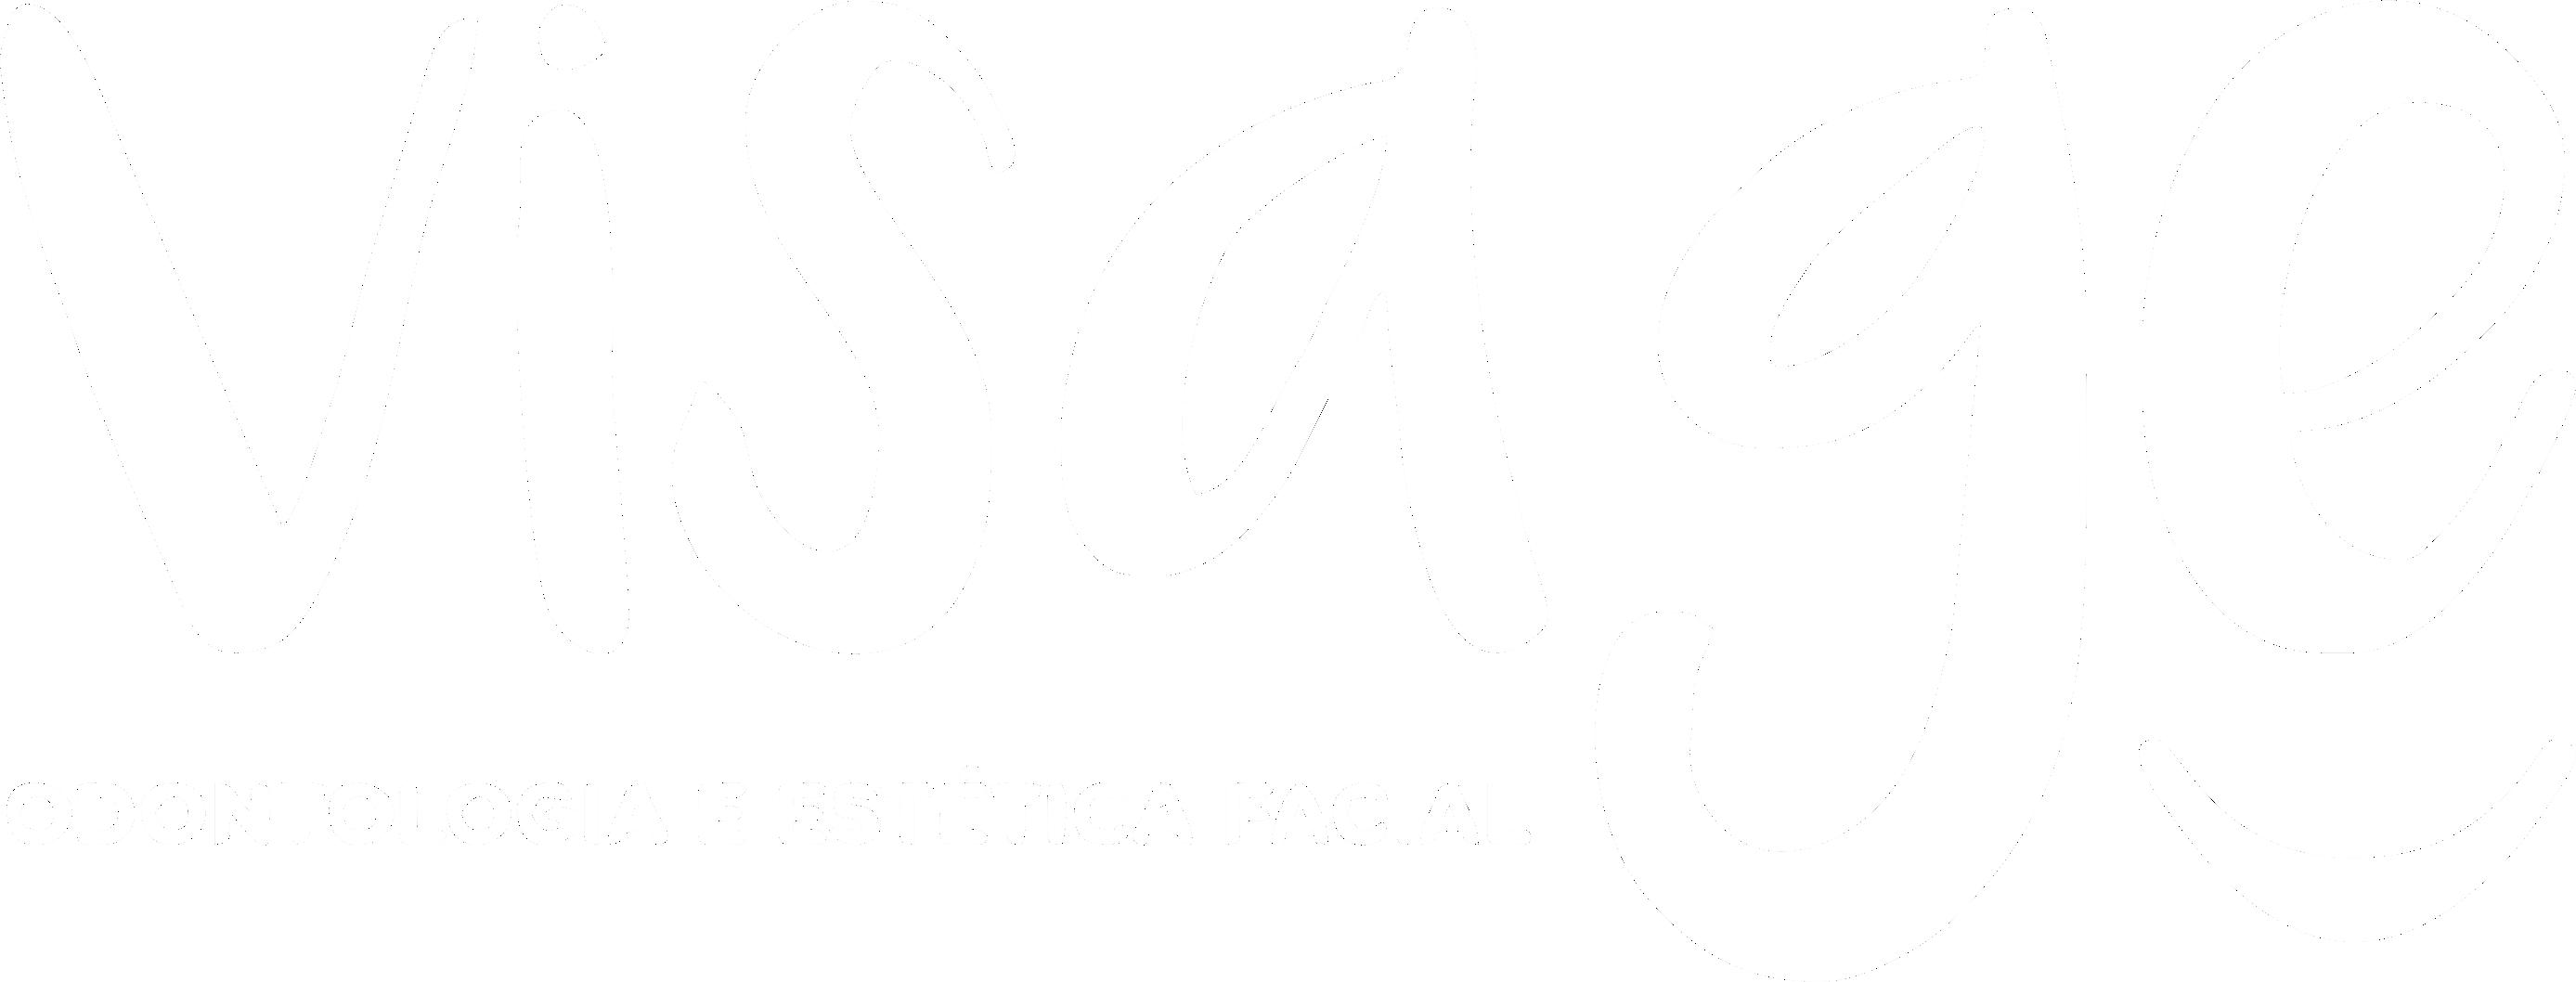 visage.png